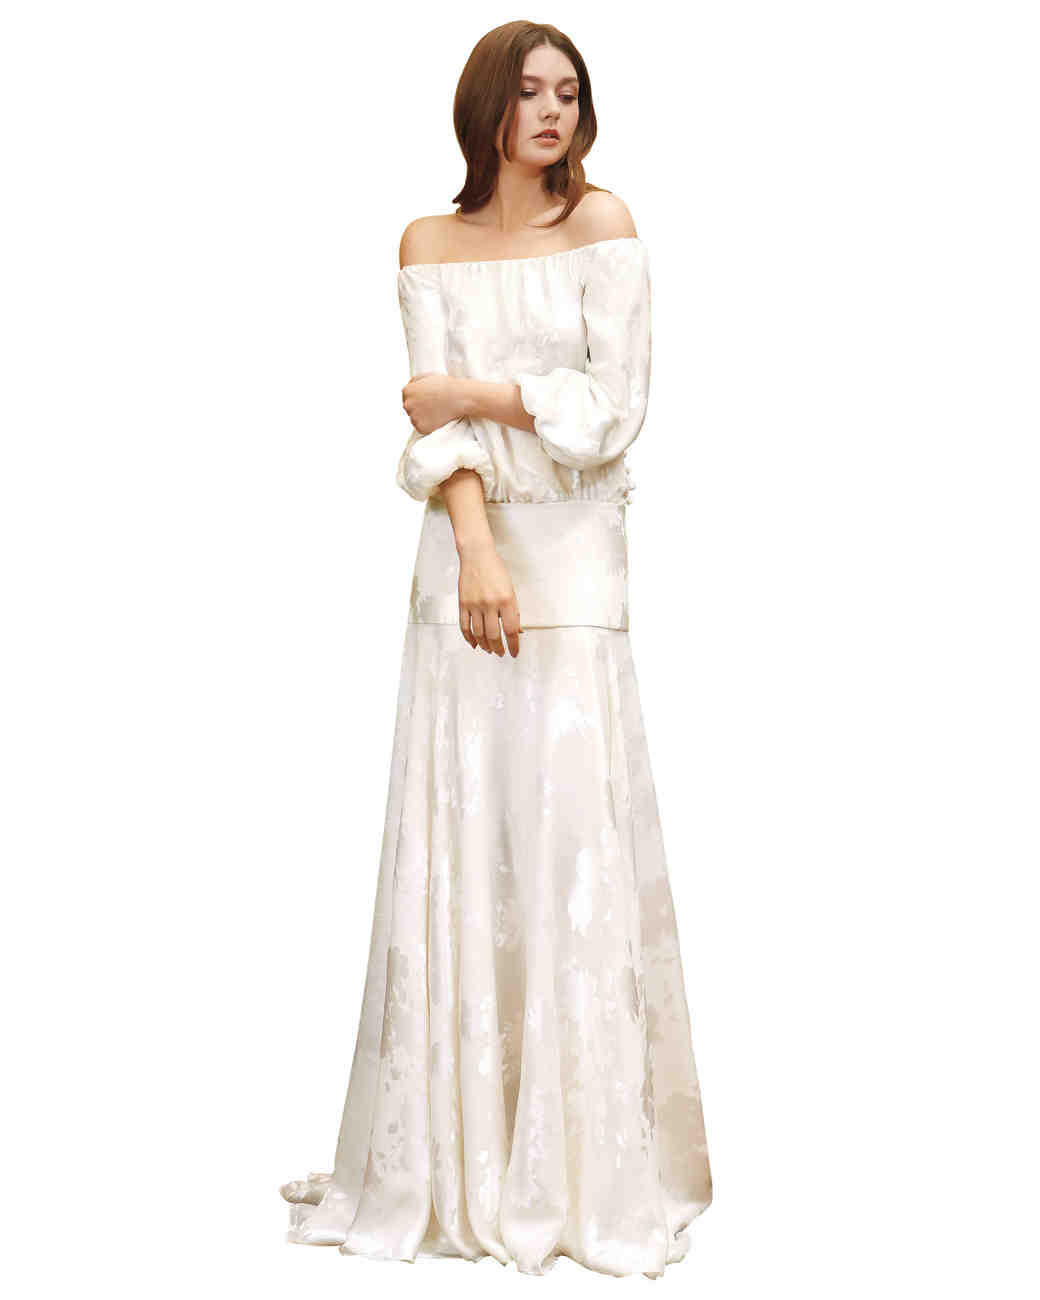 50 Wedding Dresses for Every Bride\'s State Pride | Martha Stewart ...